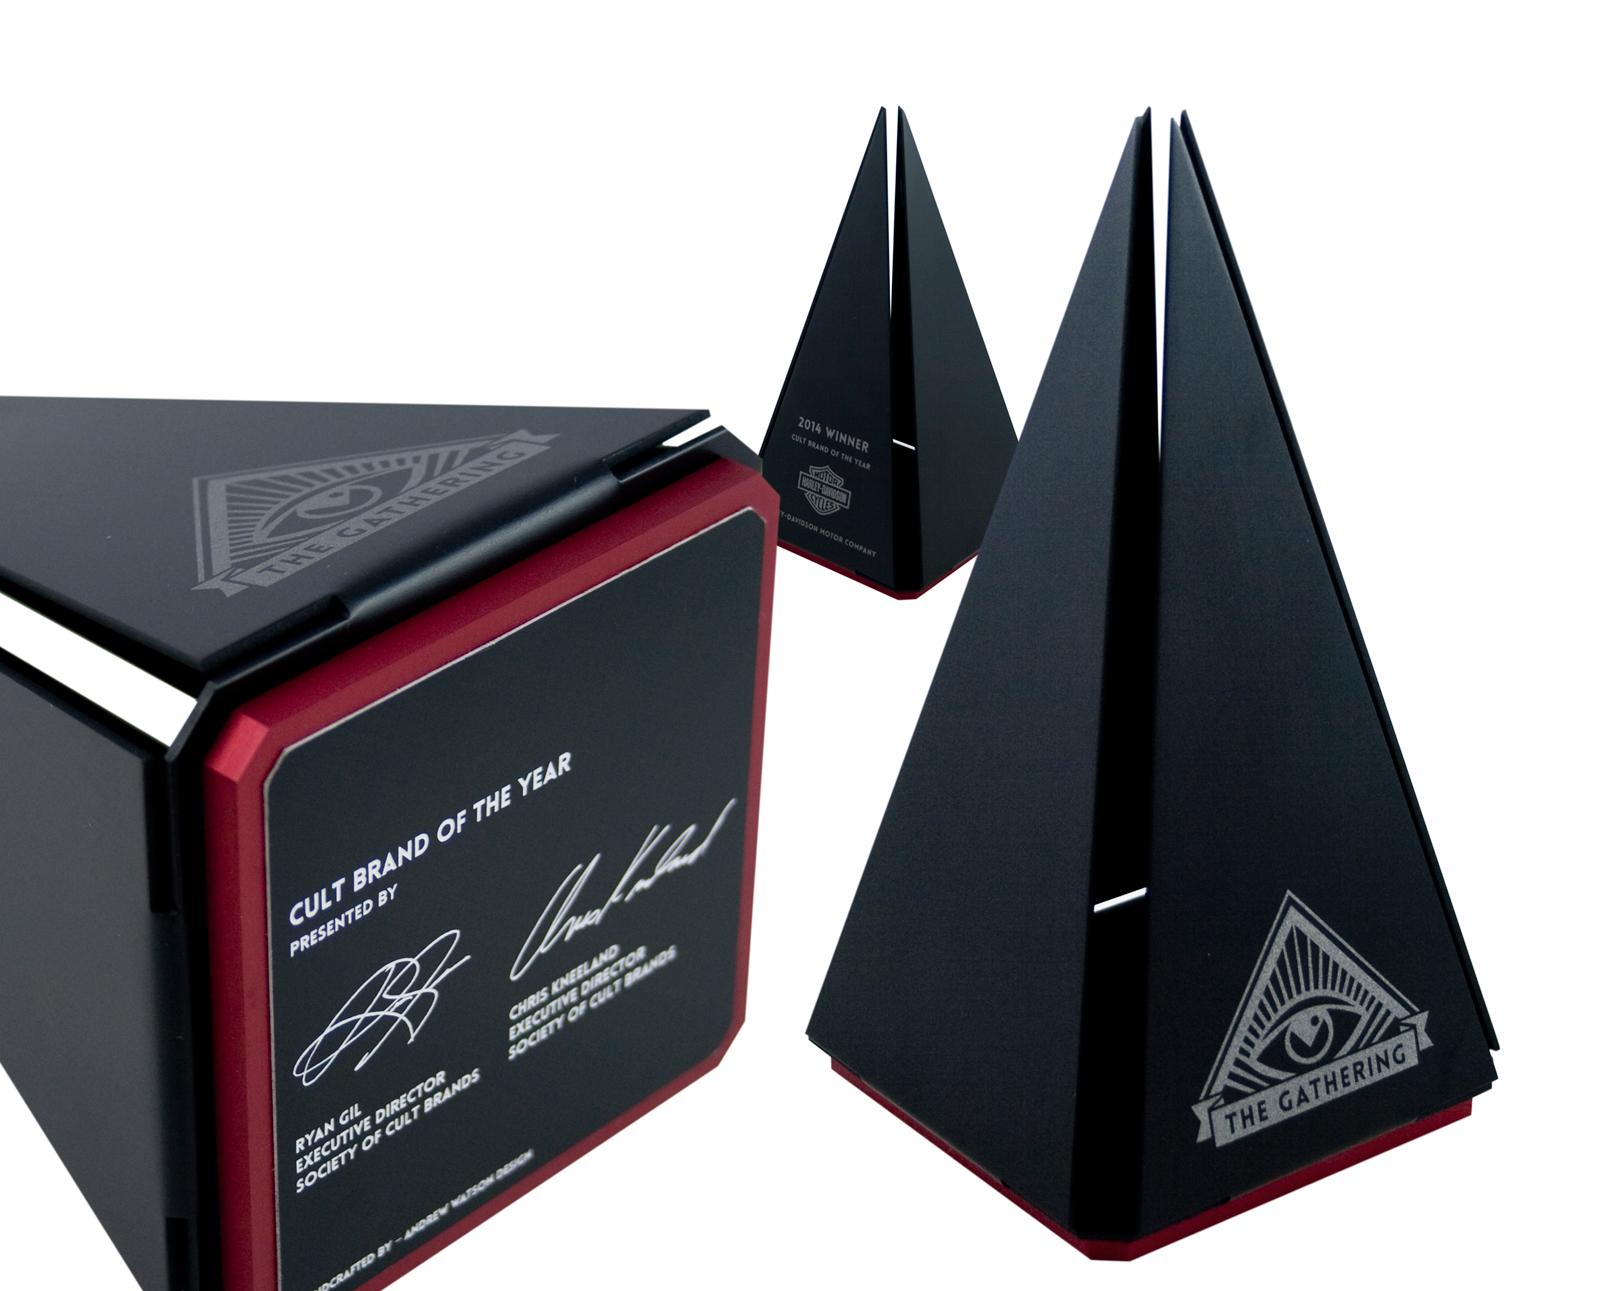 custom trophy design, custom award design, custom trophy, custom award, custom trophies, unique trophies, unique awards, modern trophy, modern award